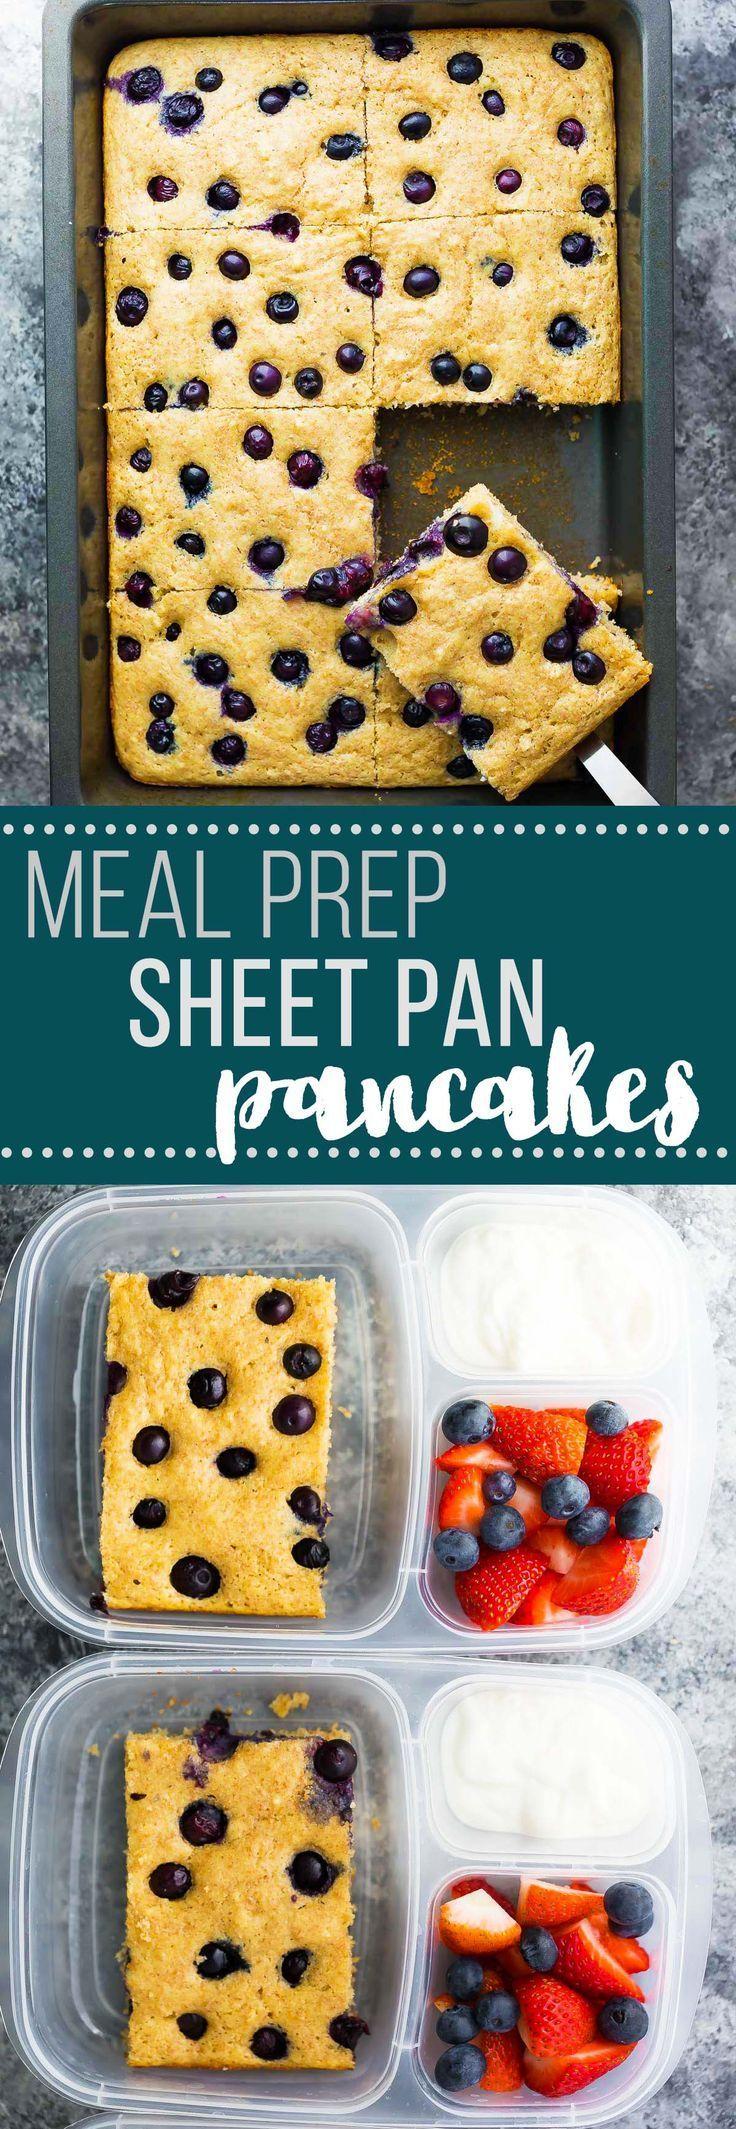 1243 best Cute Food & Bentos images on Pinterest   Bento lunchbox ...